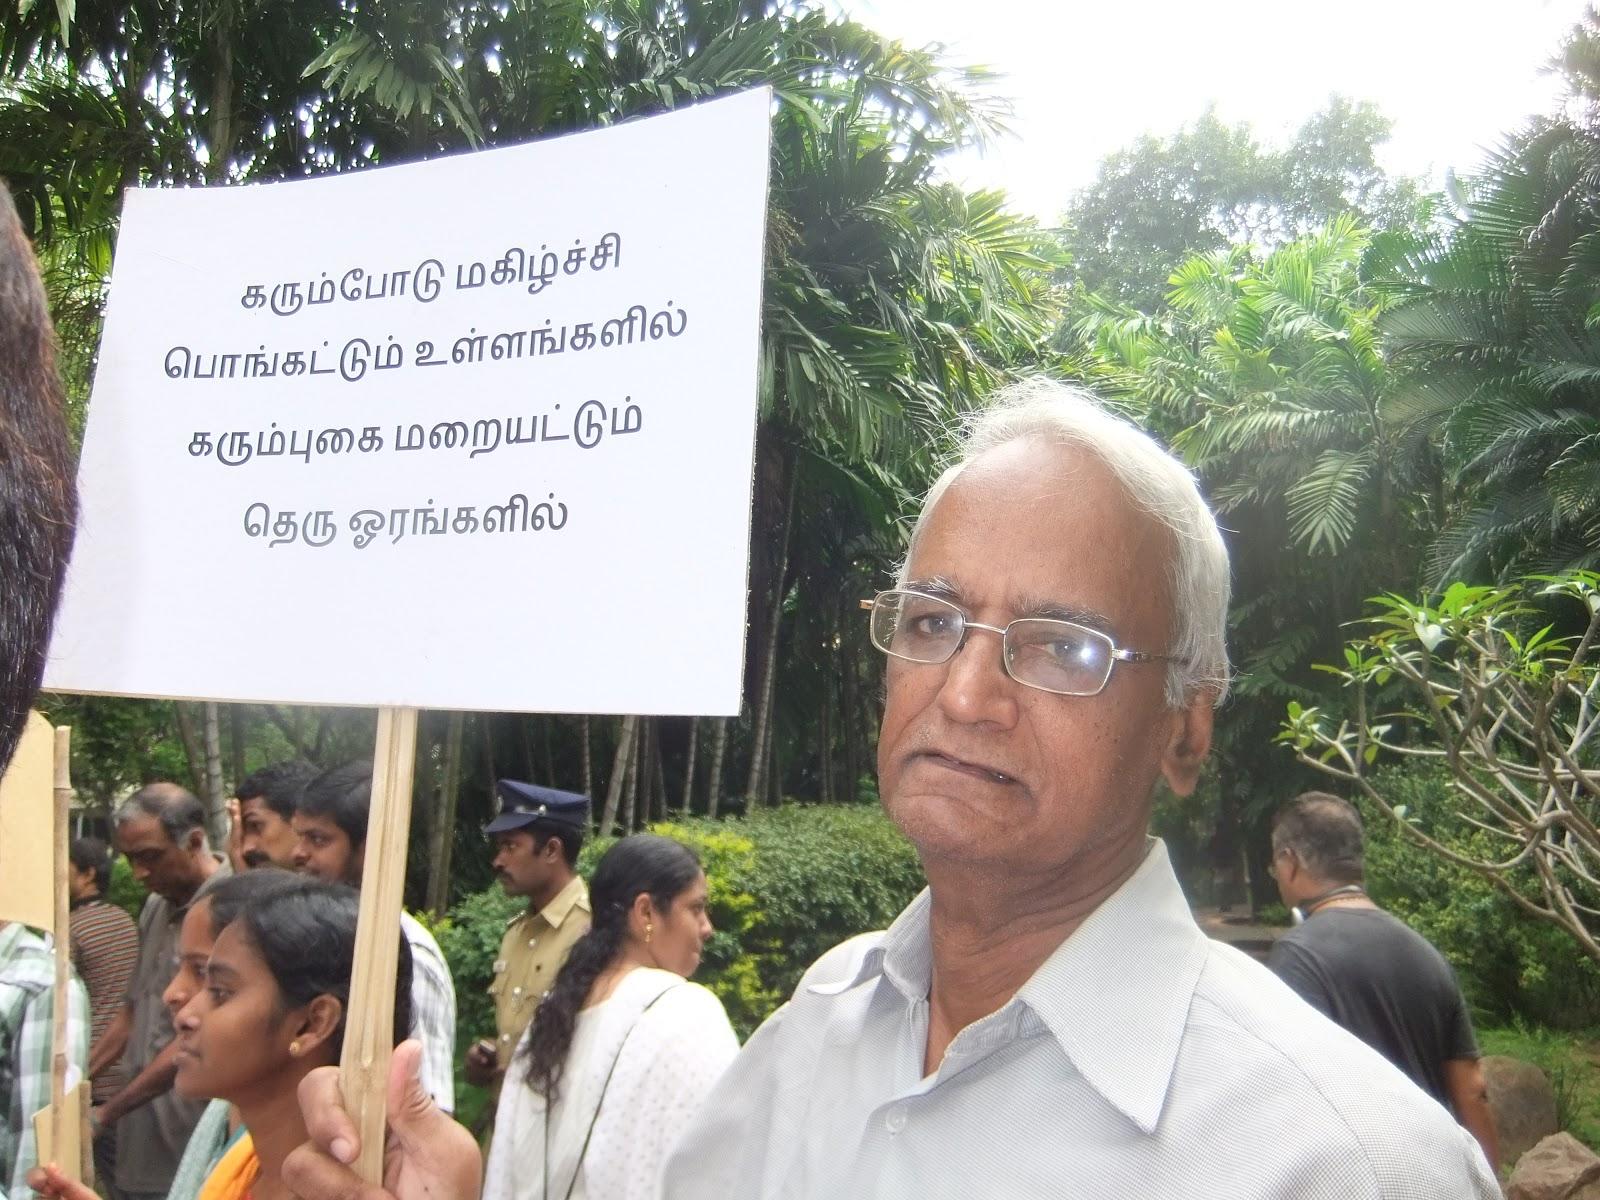 Drugs awareness slogans in tamil